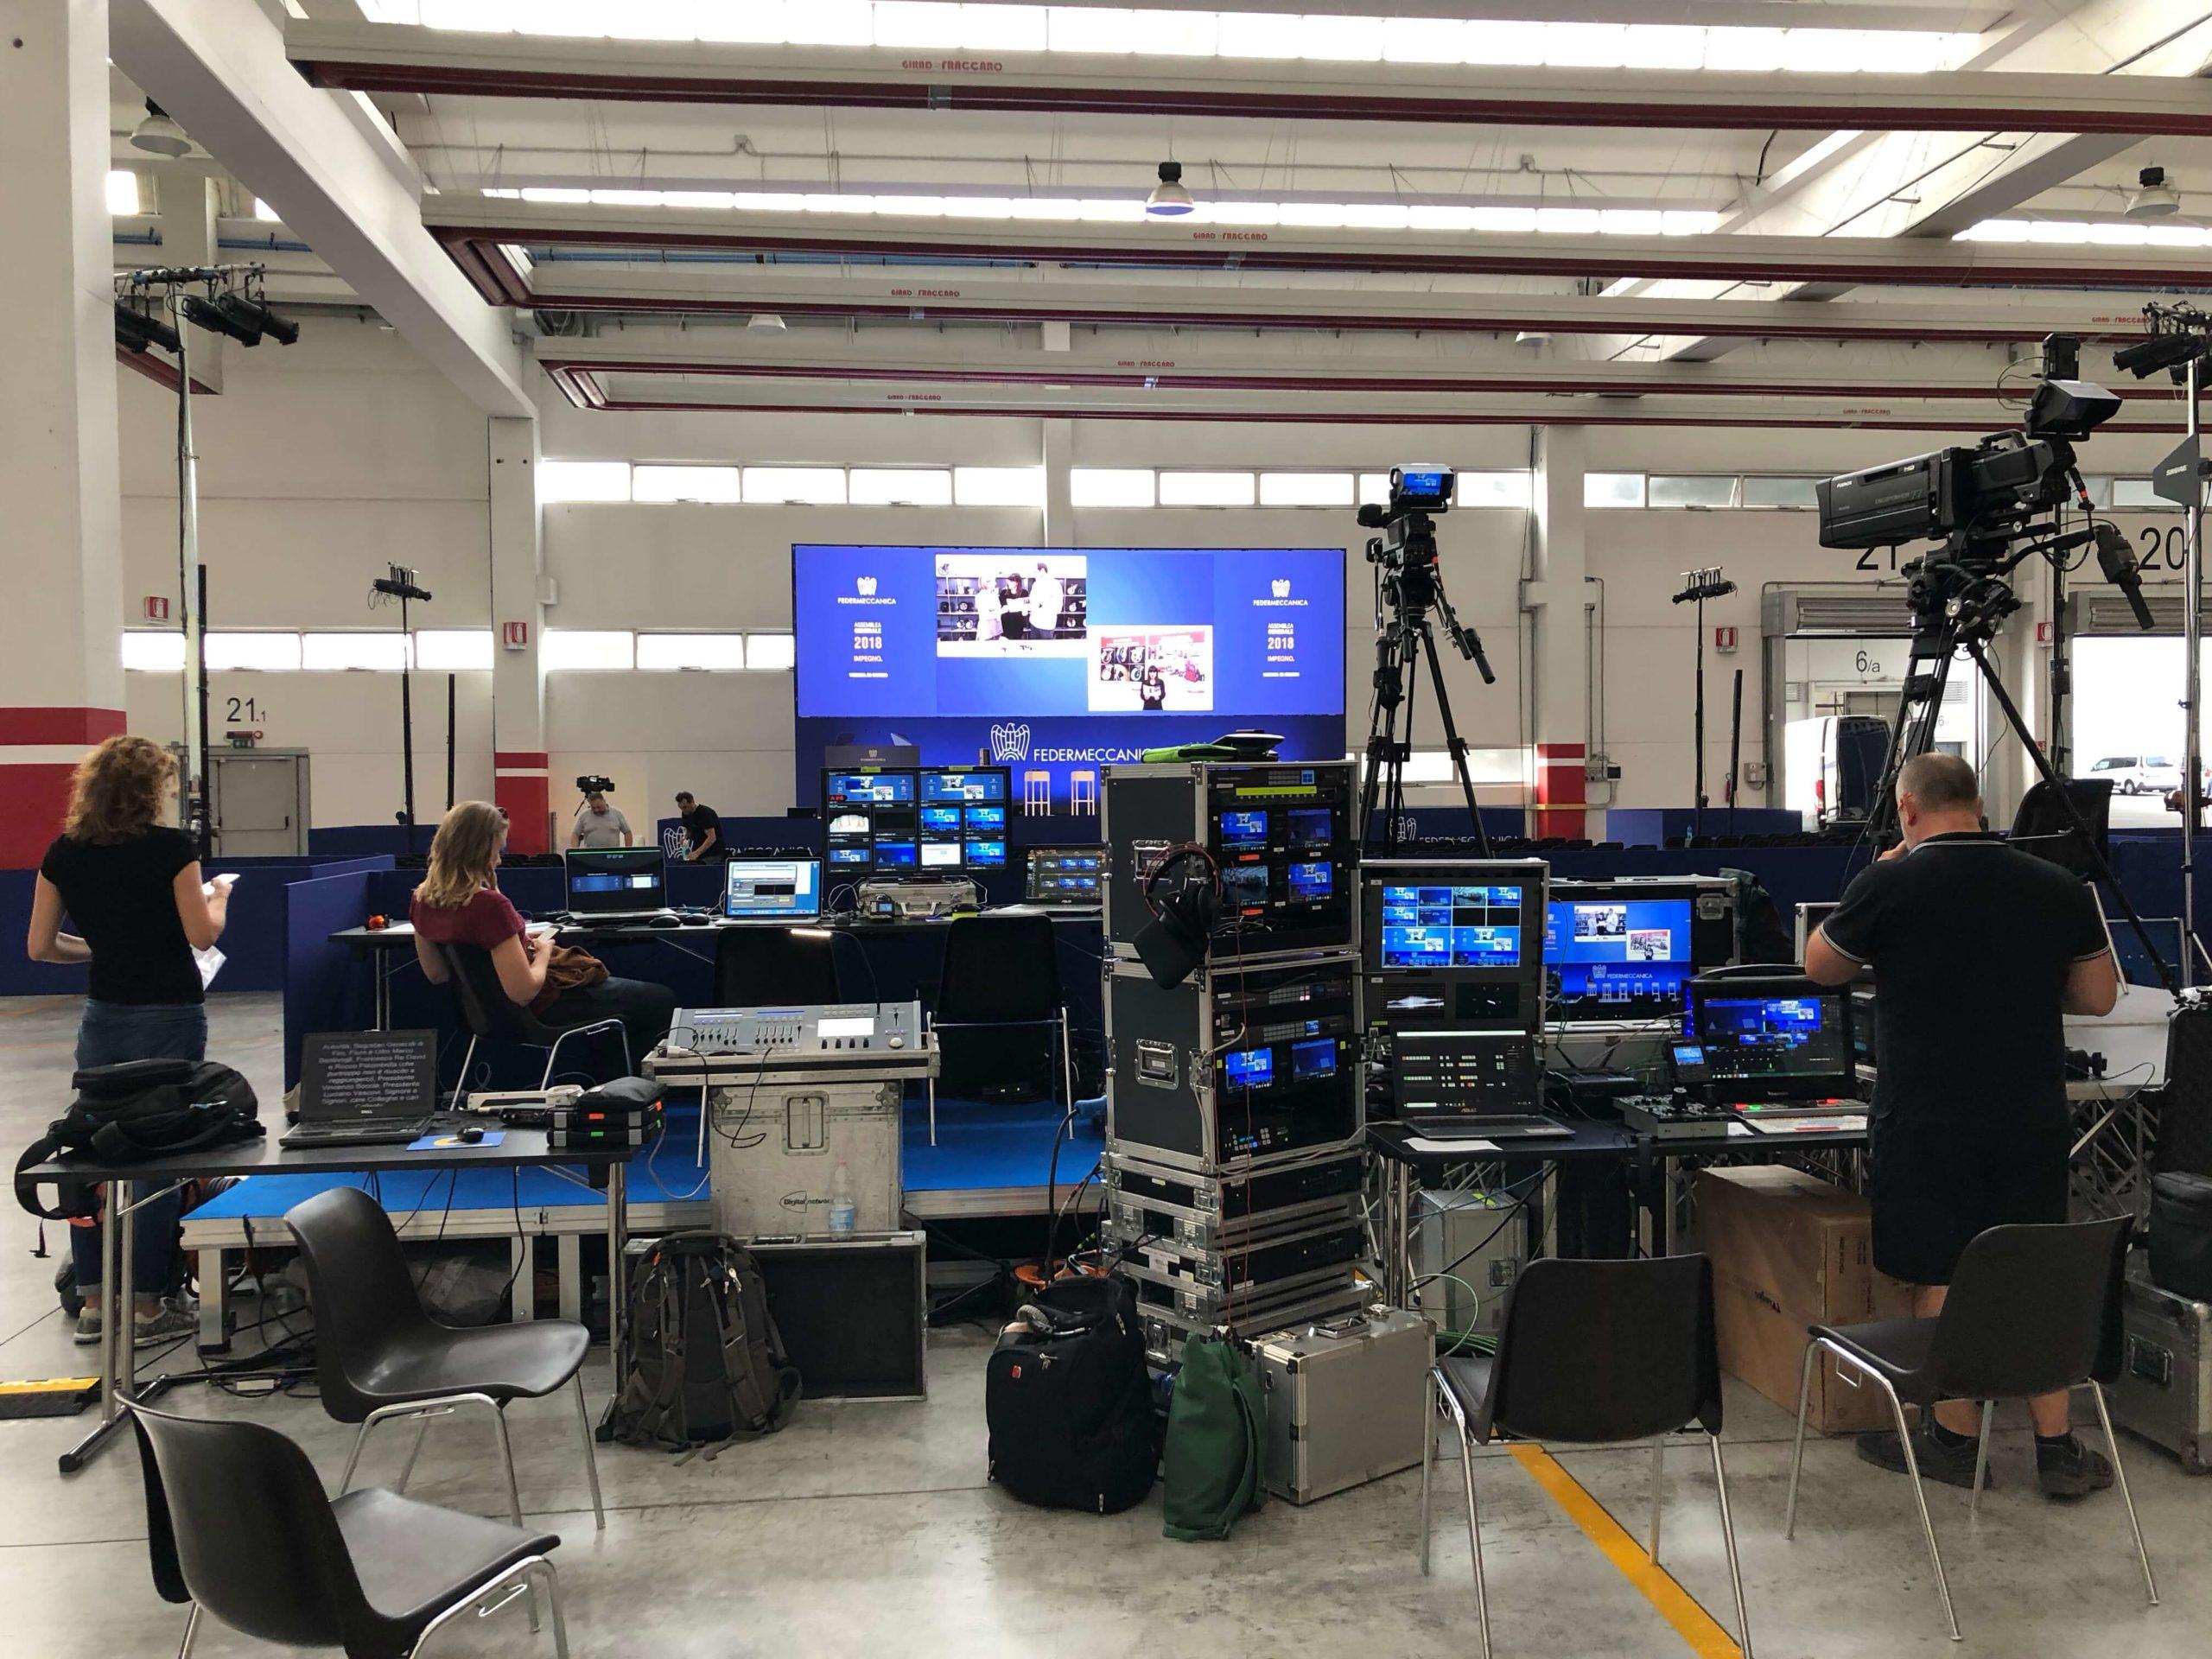 Assemblea generale 2018 Federmeccanica - backstage allestimento evento